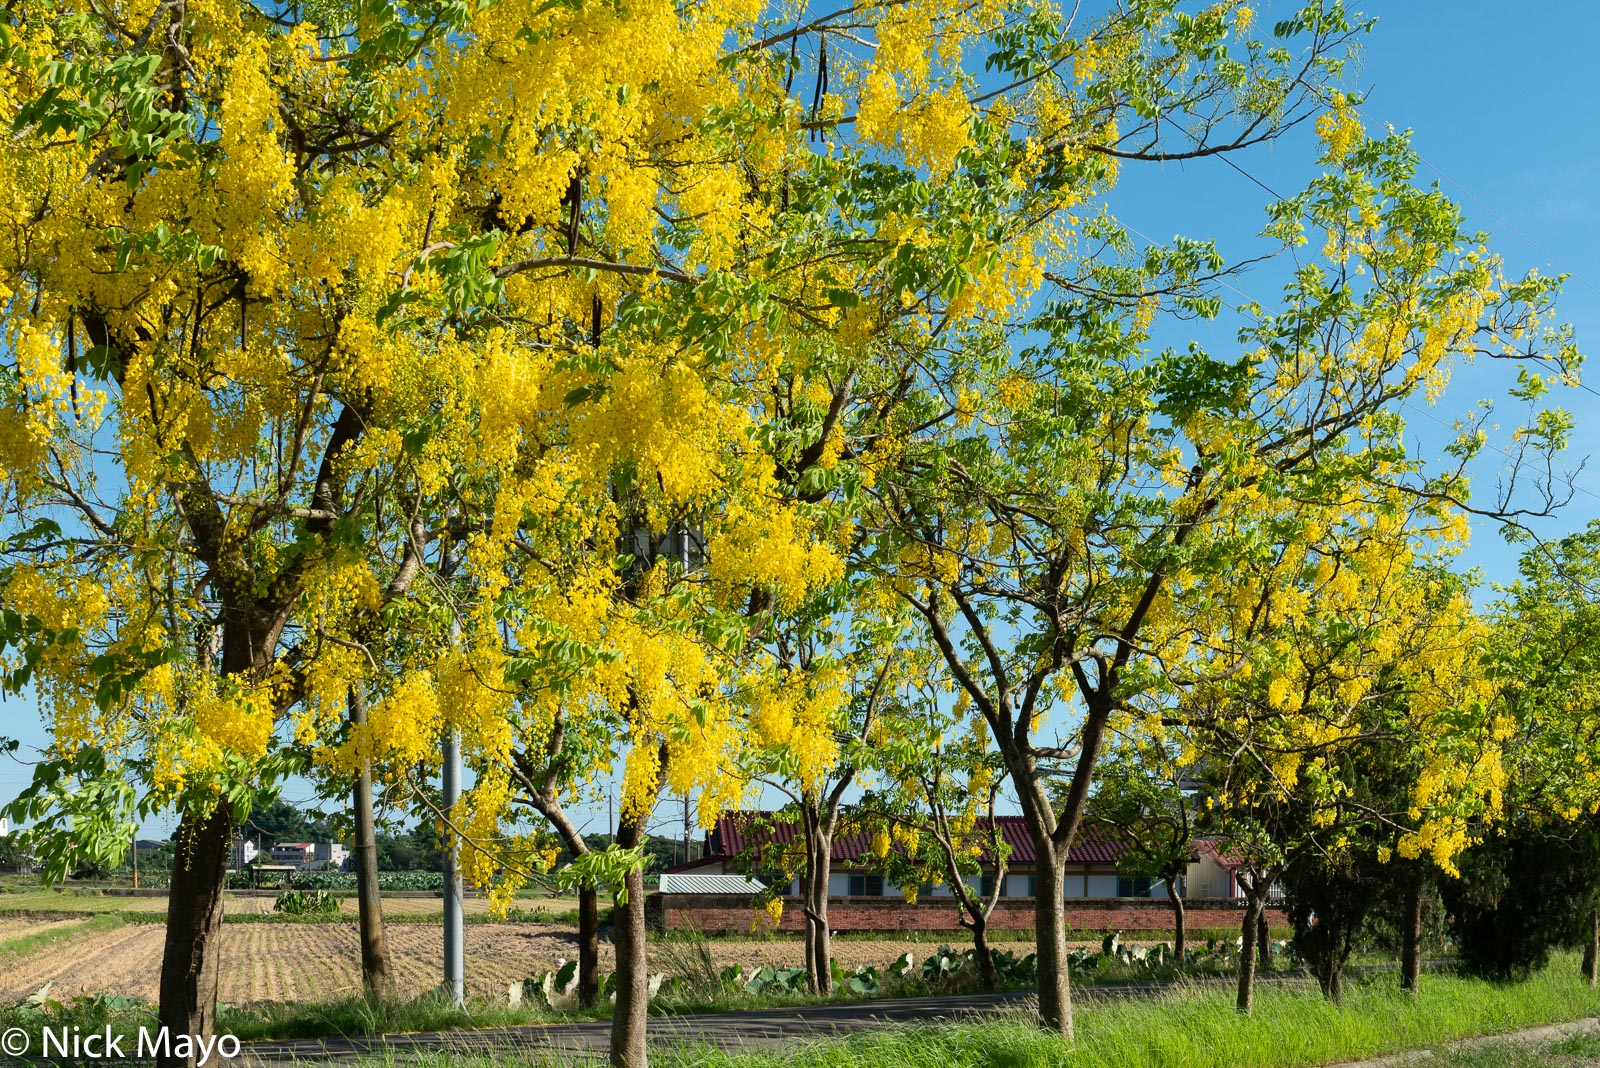 Blooming Indian laburnum trees at Shanzihjiao in Tainan County.